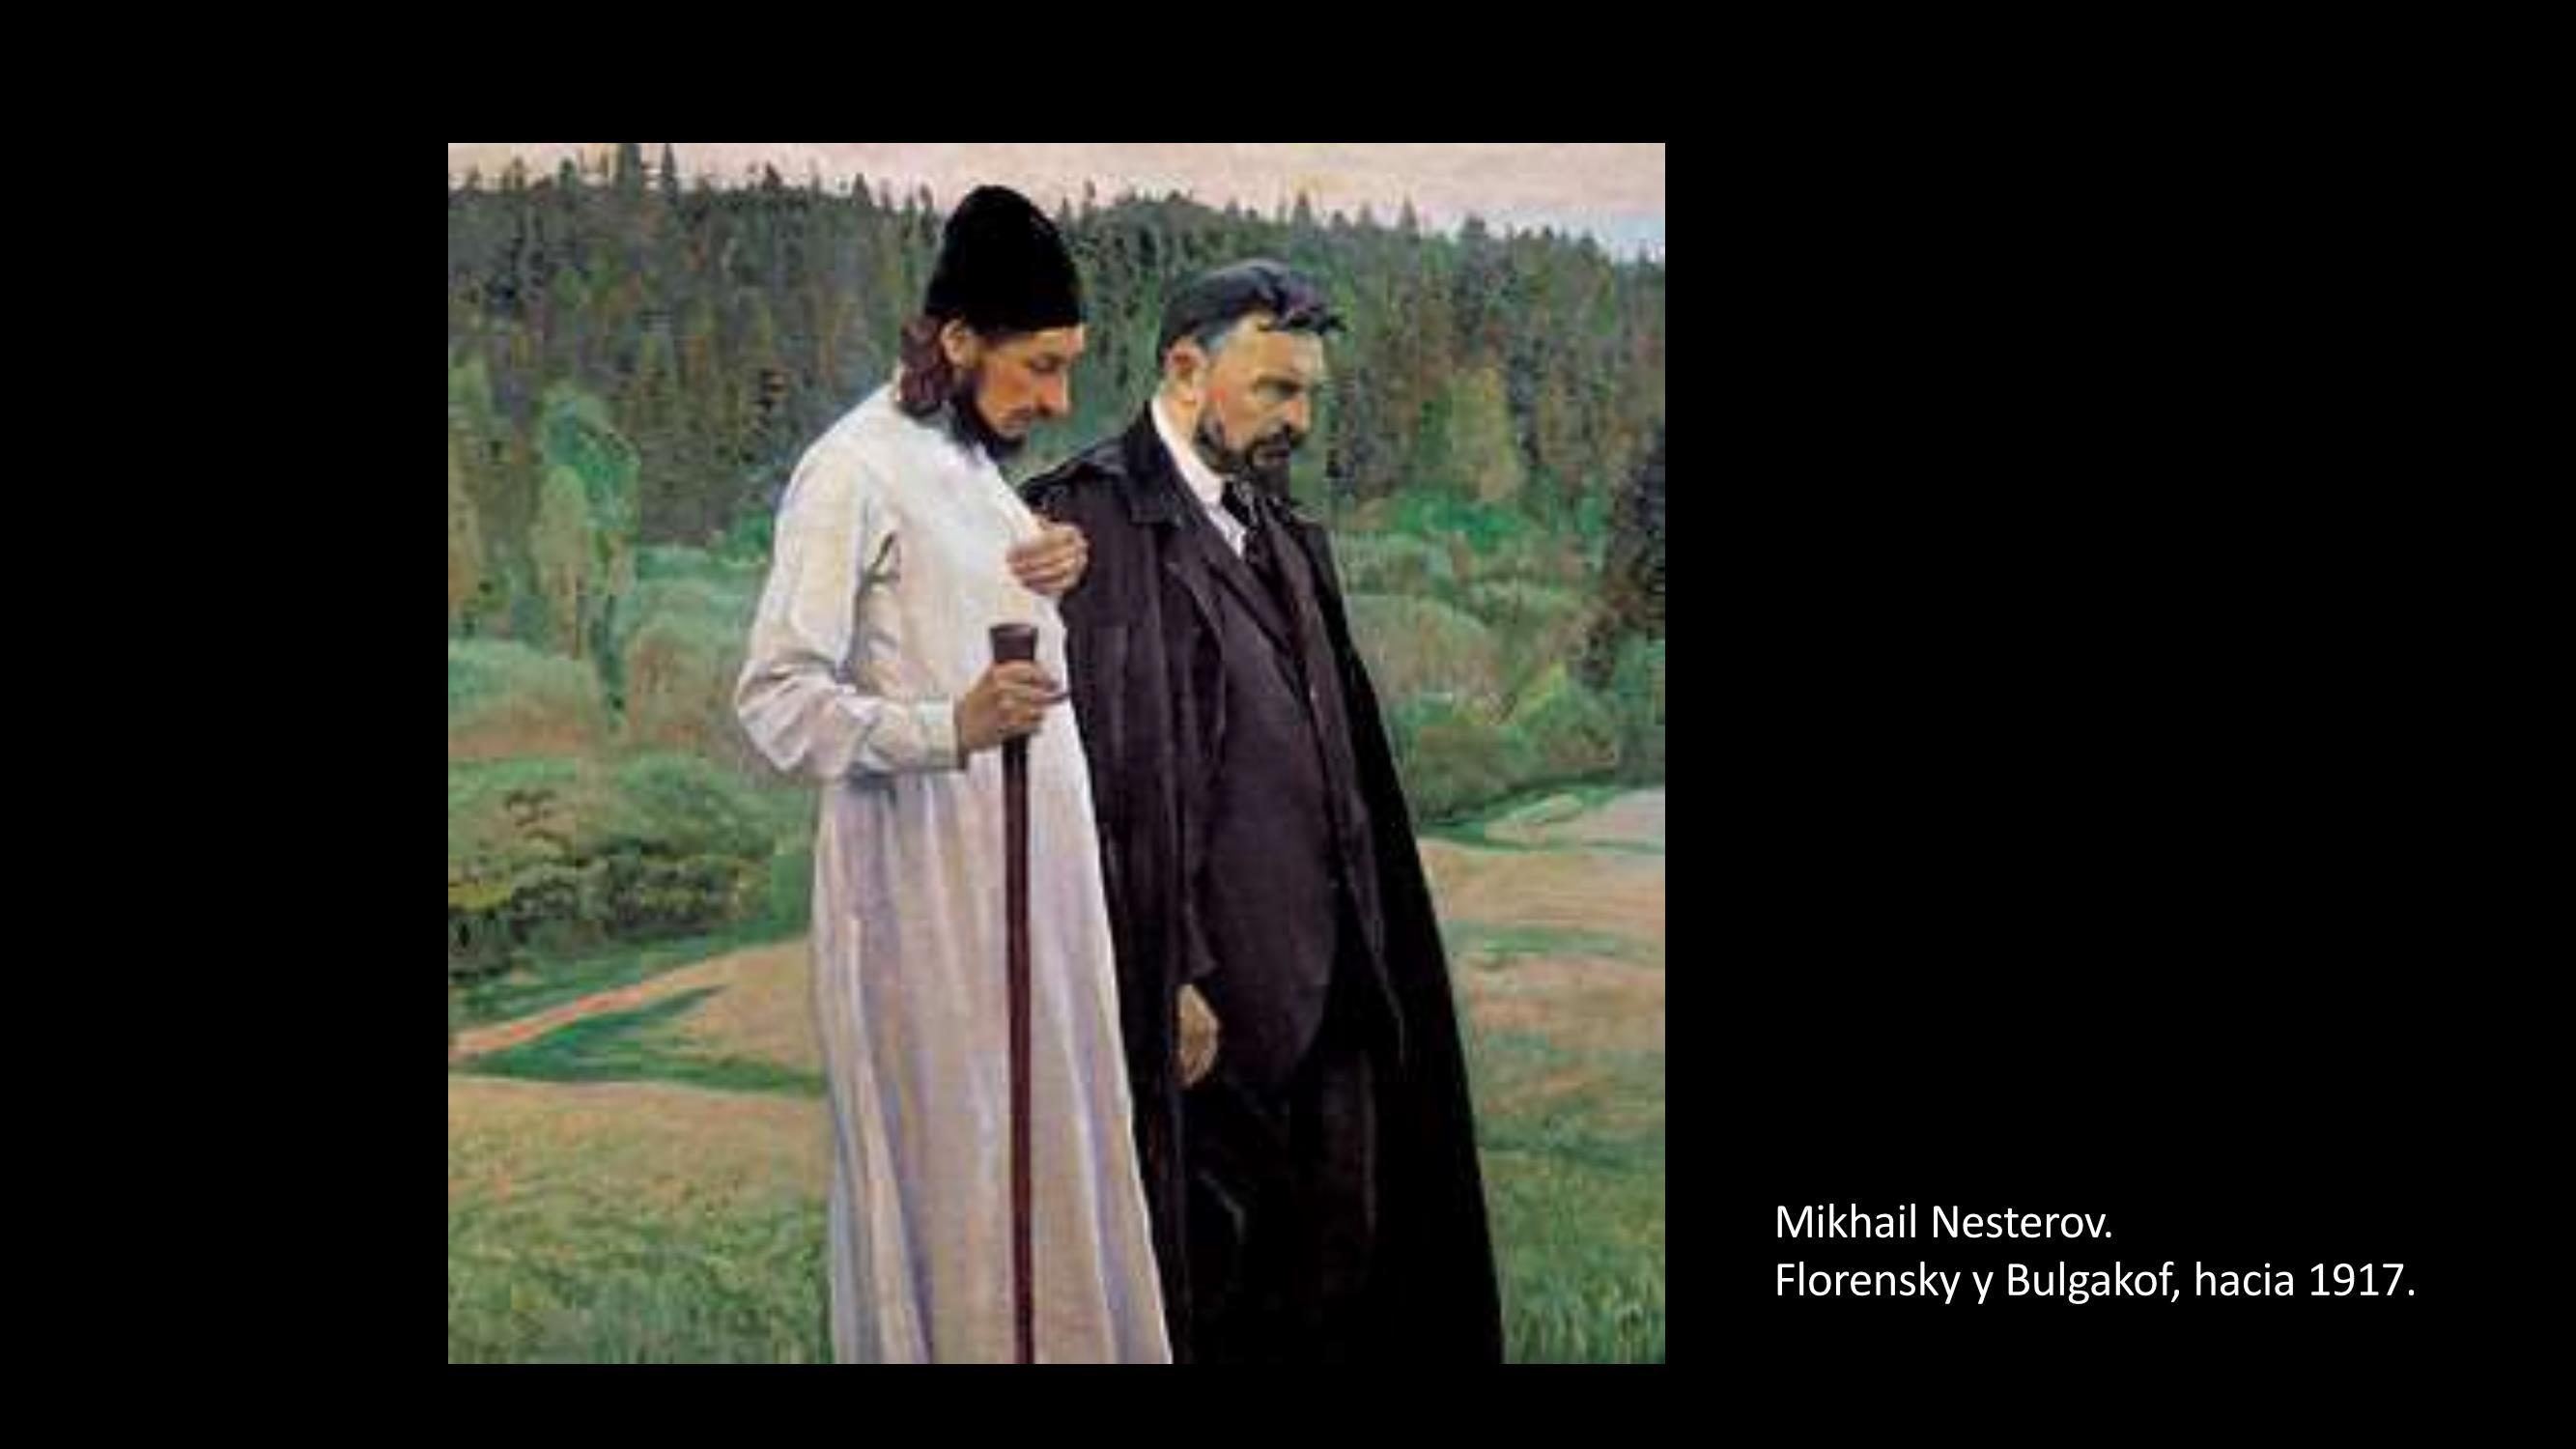 [17] Mikhail Nesterov, Florensky y Bulgakof